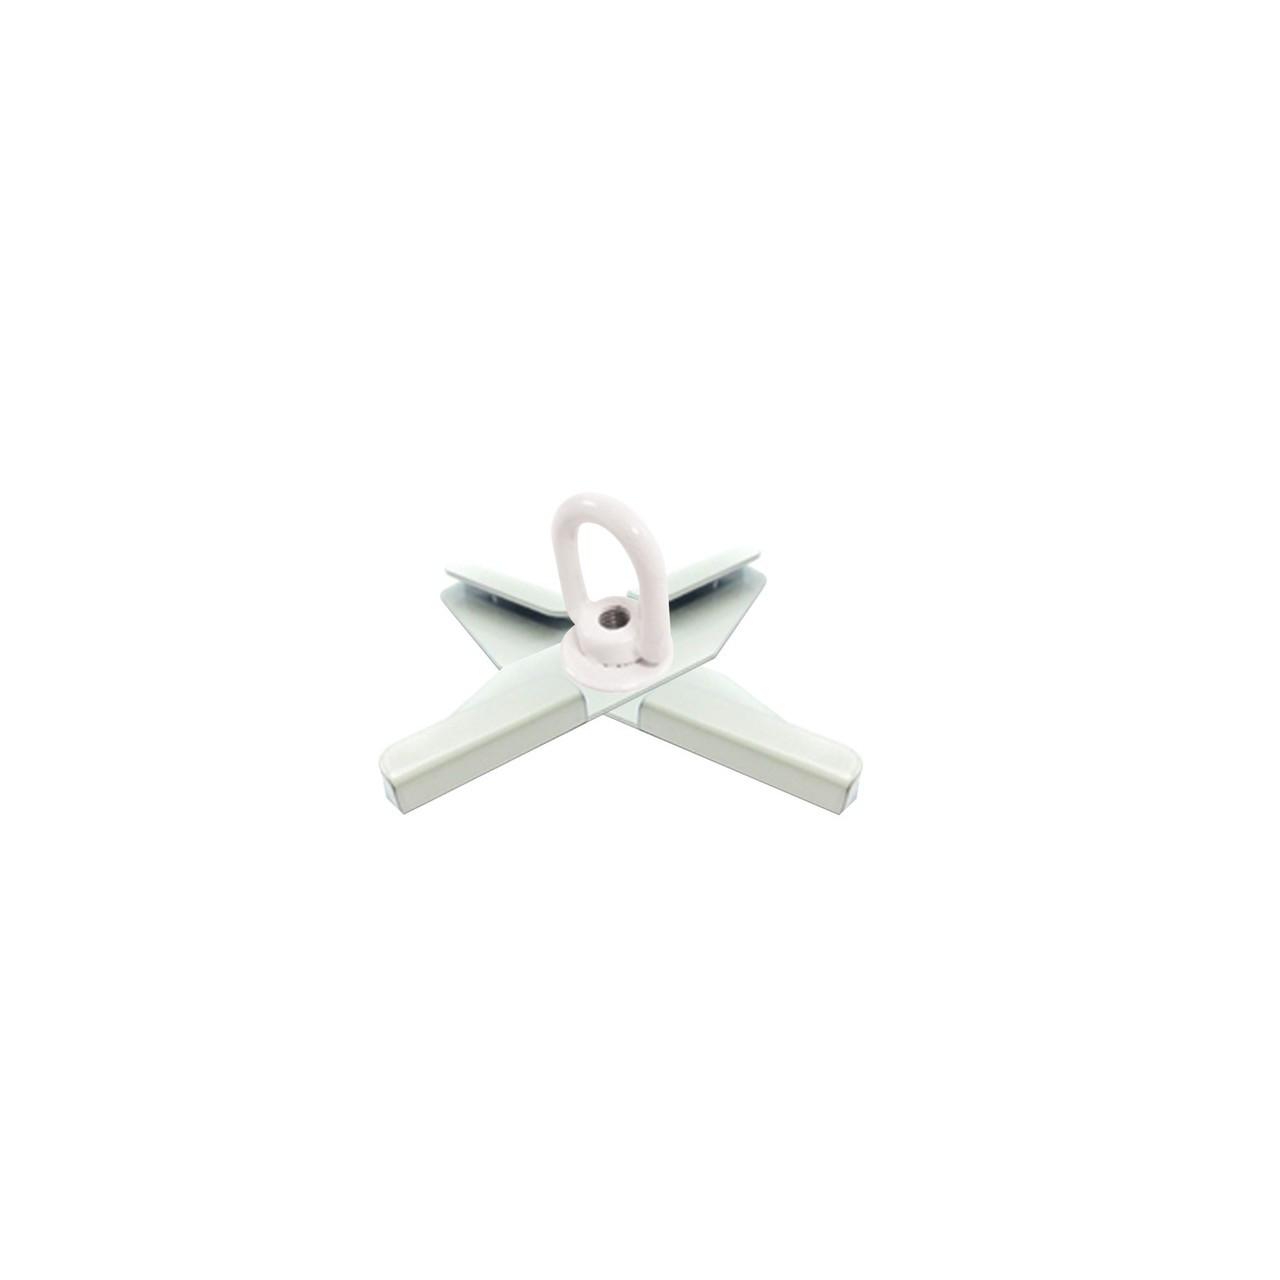 chauvet scissorclips scissor clips